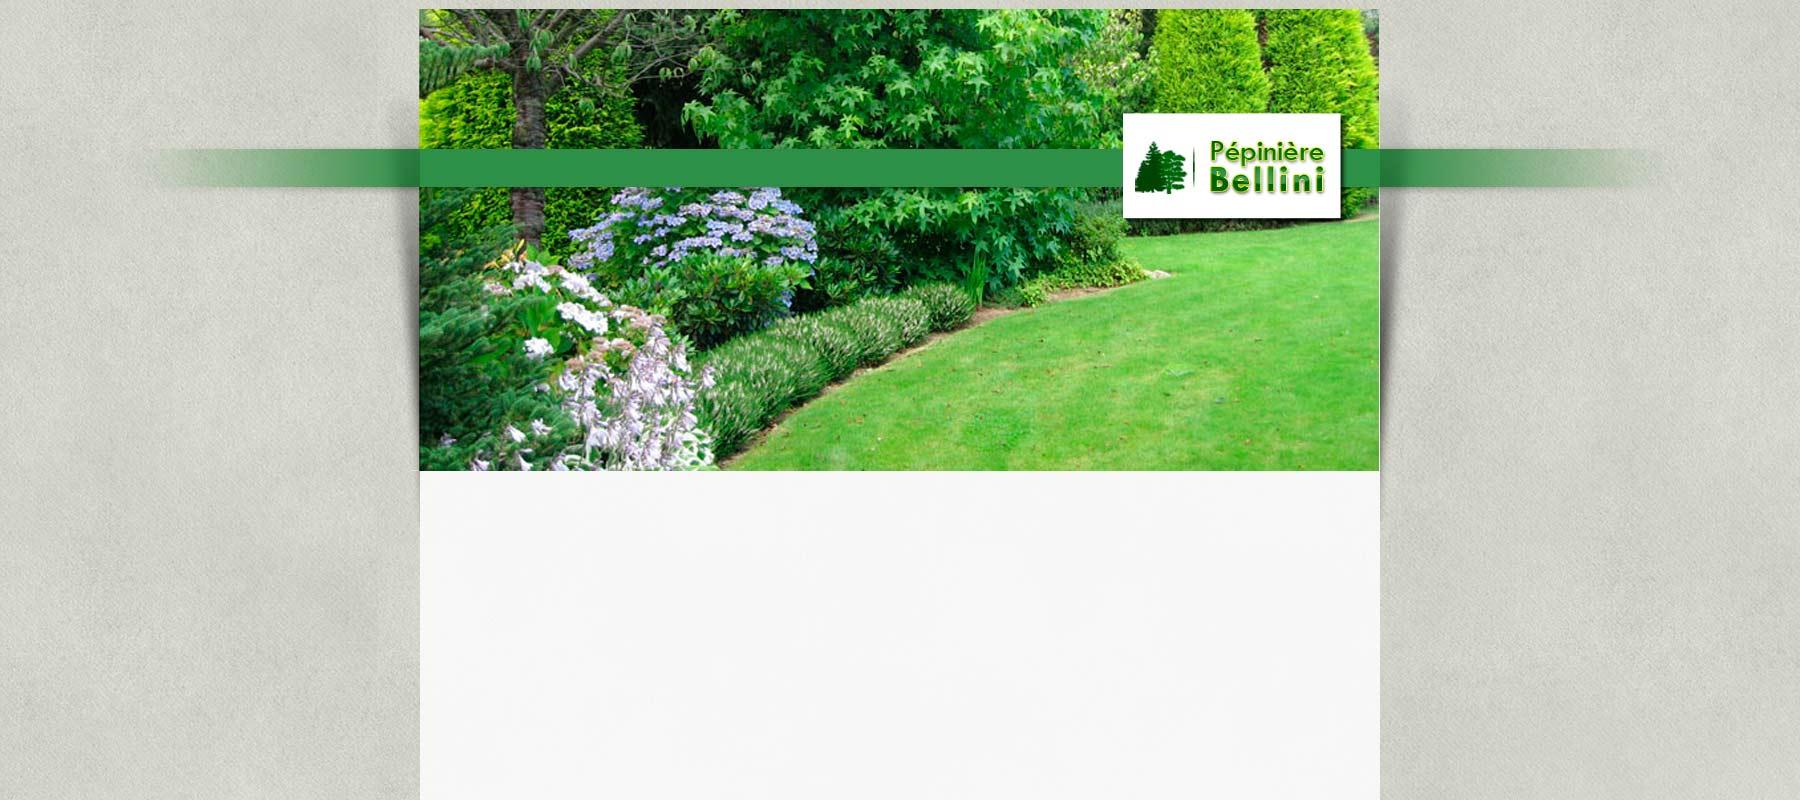 Bellini entreprise courcelles t l 071453 jardins for Entretien jardin 72